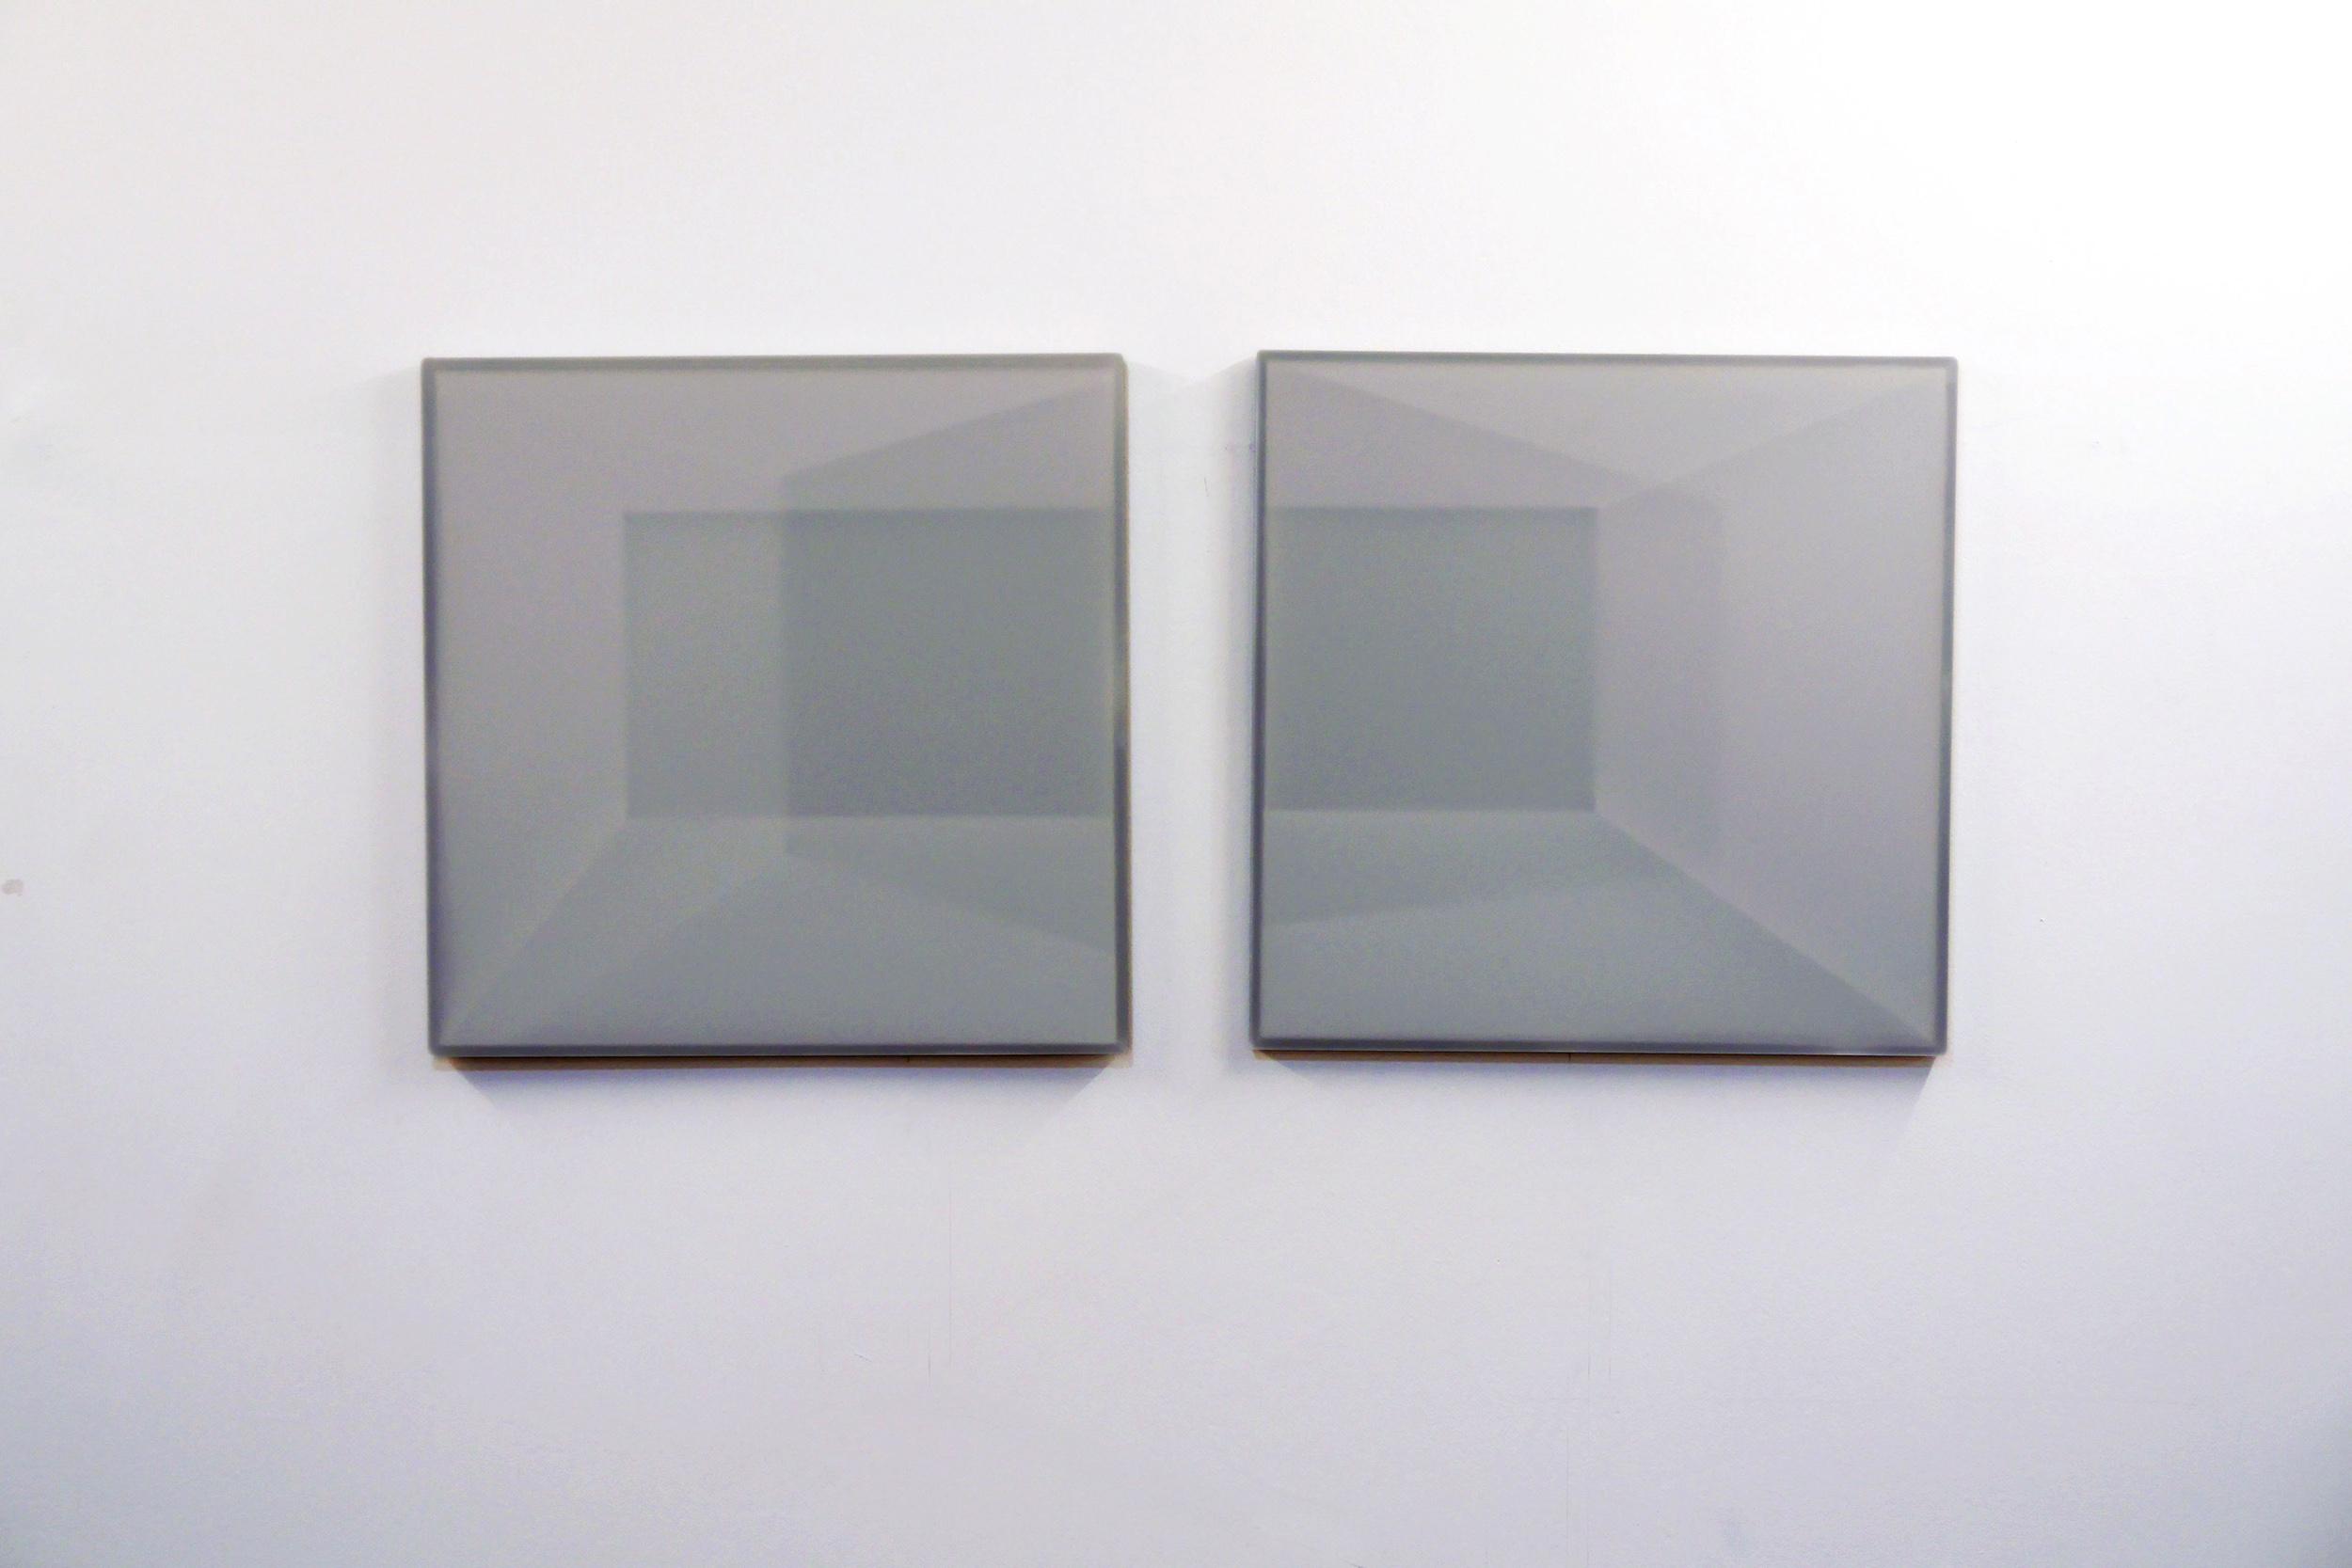 Karyn Taylor, Plato's Room III , 2015, Perspex, draughting film, 90 x 40cm